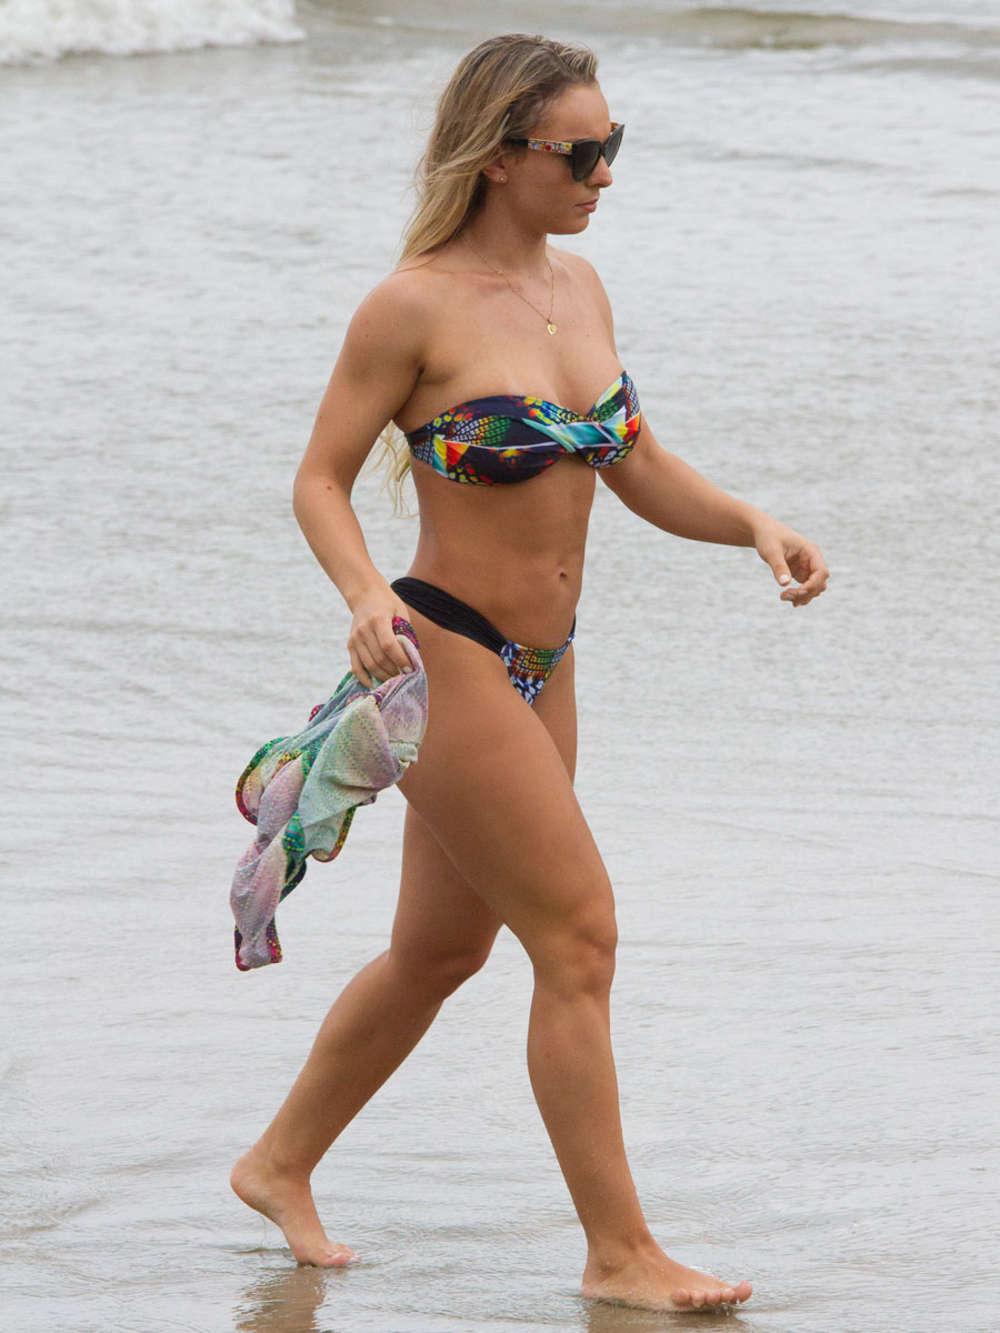 Bikini Monica Carvalho nudes (95 photo), Ass, Leaked, Feet, cleavage 2006